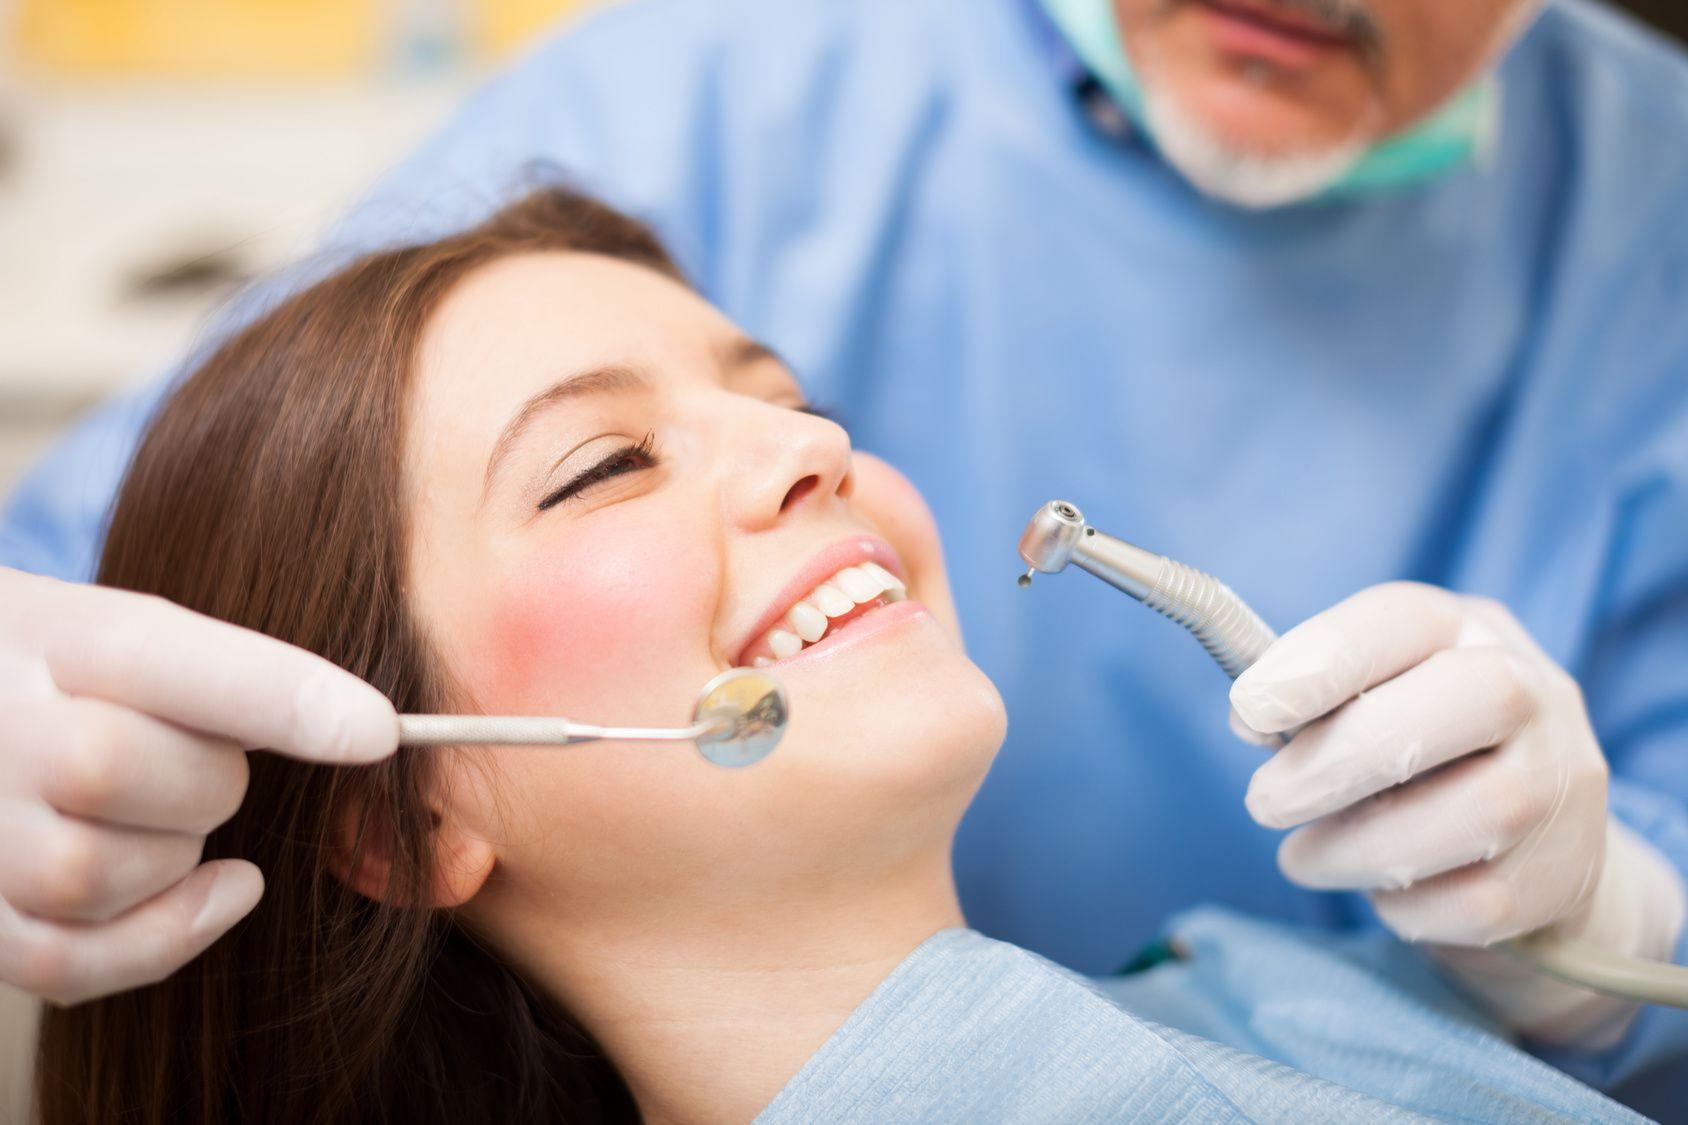 Girl Visits Dentist